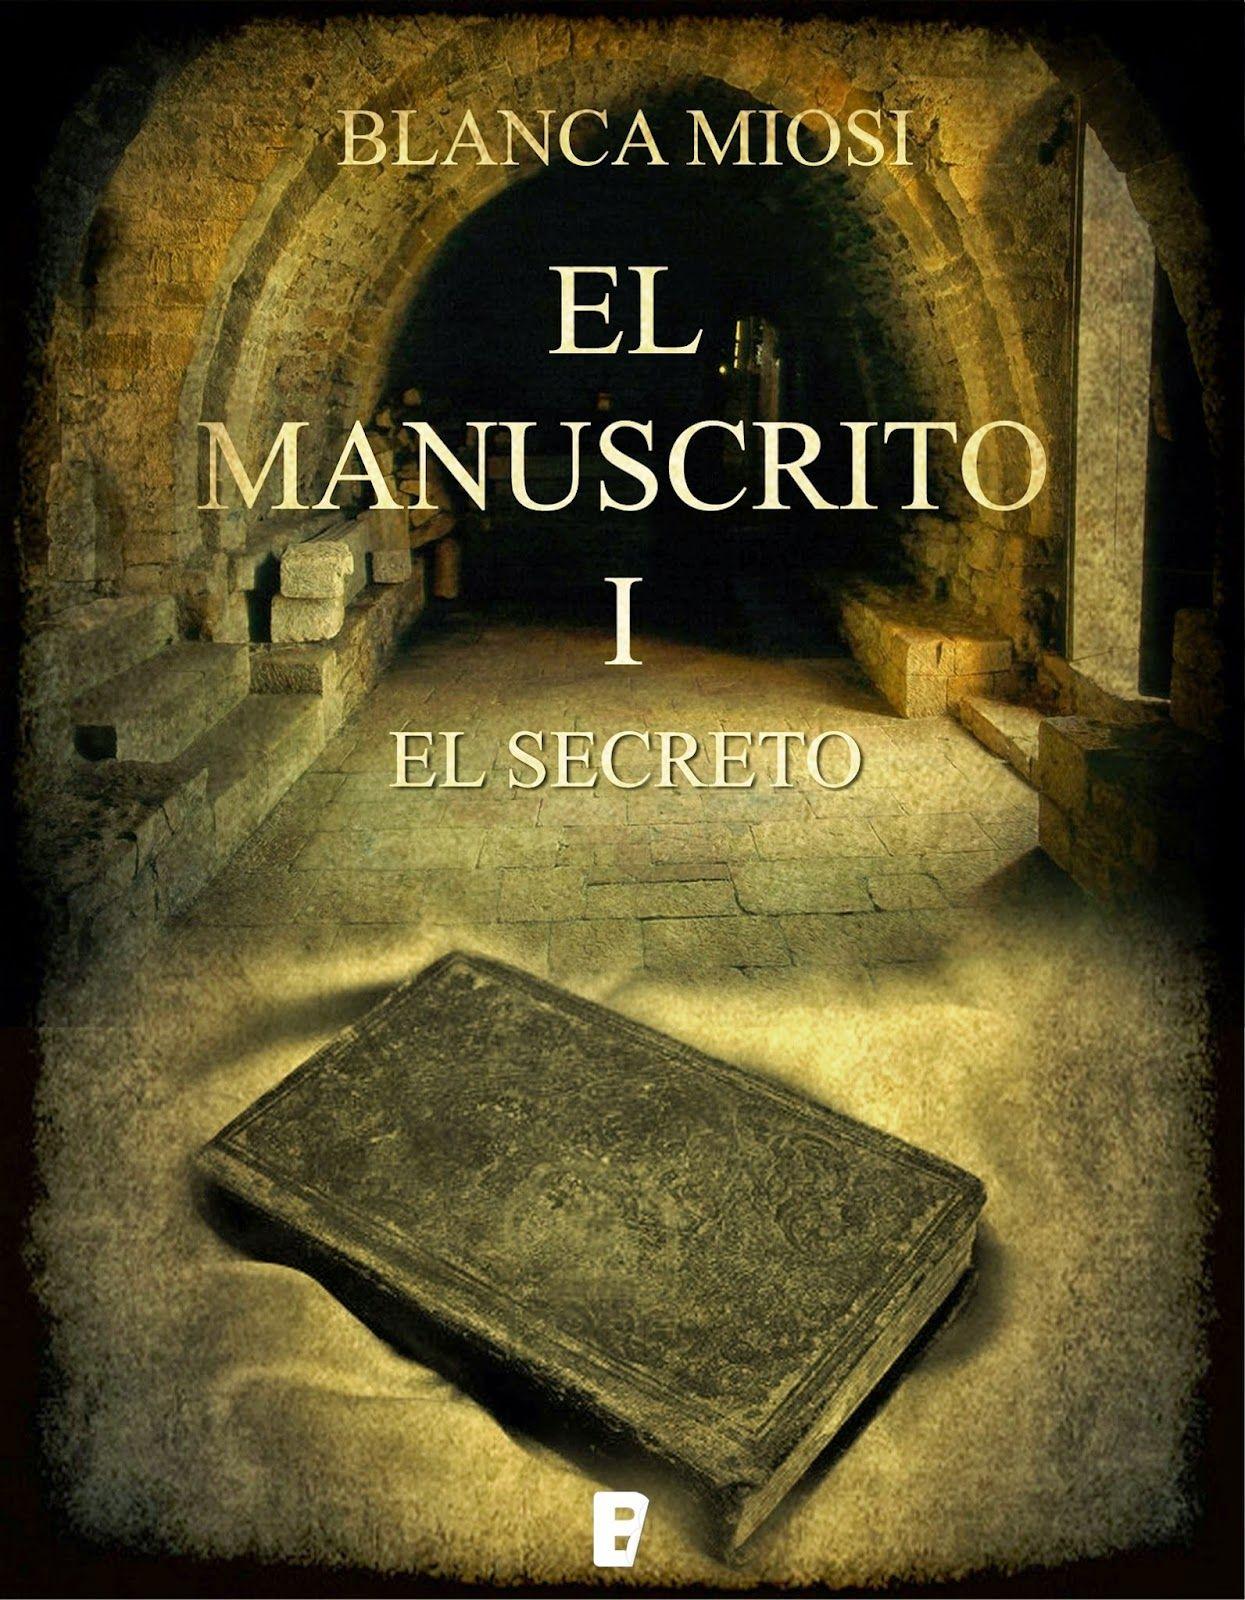 El manuscrito 1 - El secreto: El manuscrito I y el Manuscrito II - Crítica.